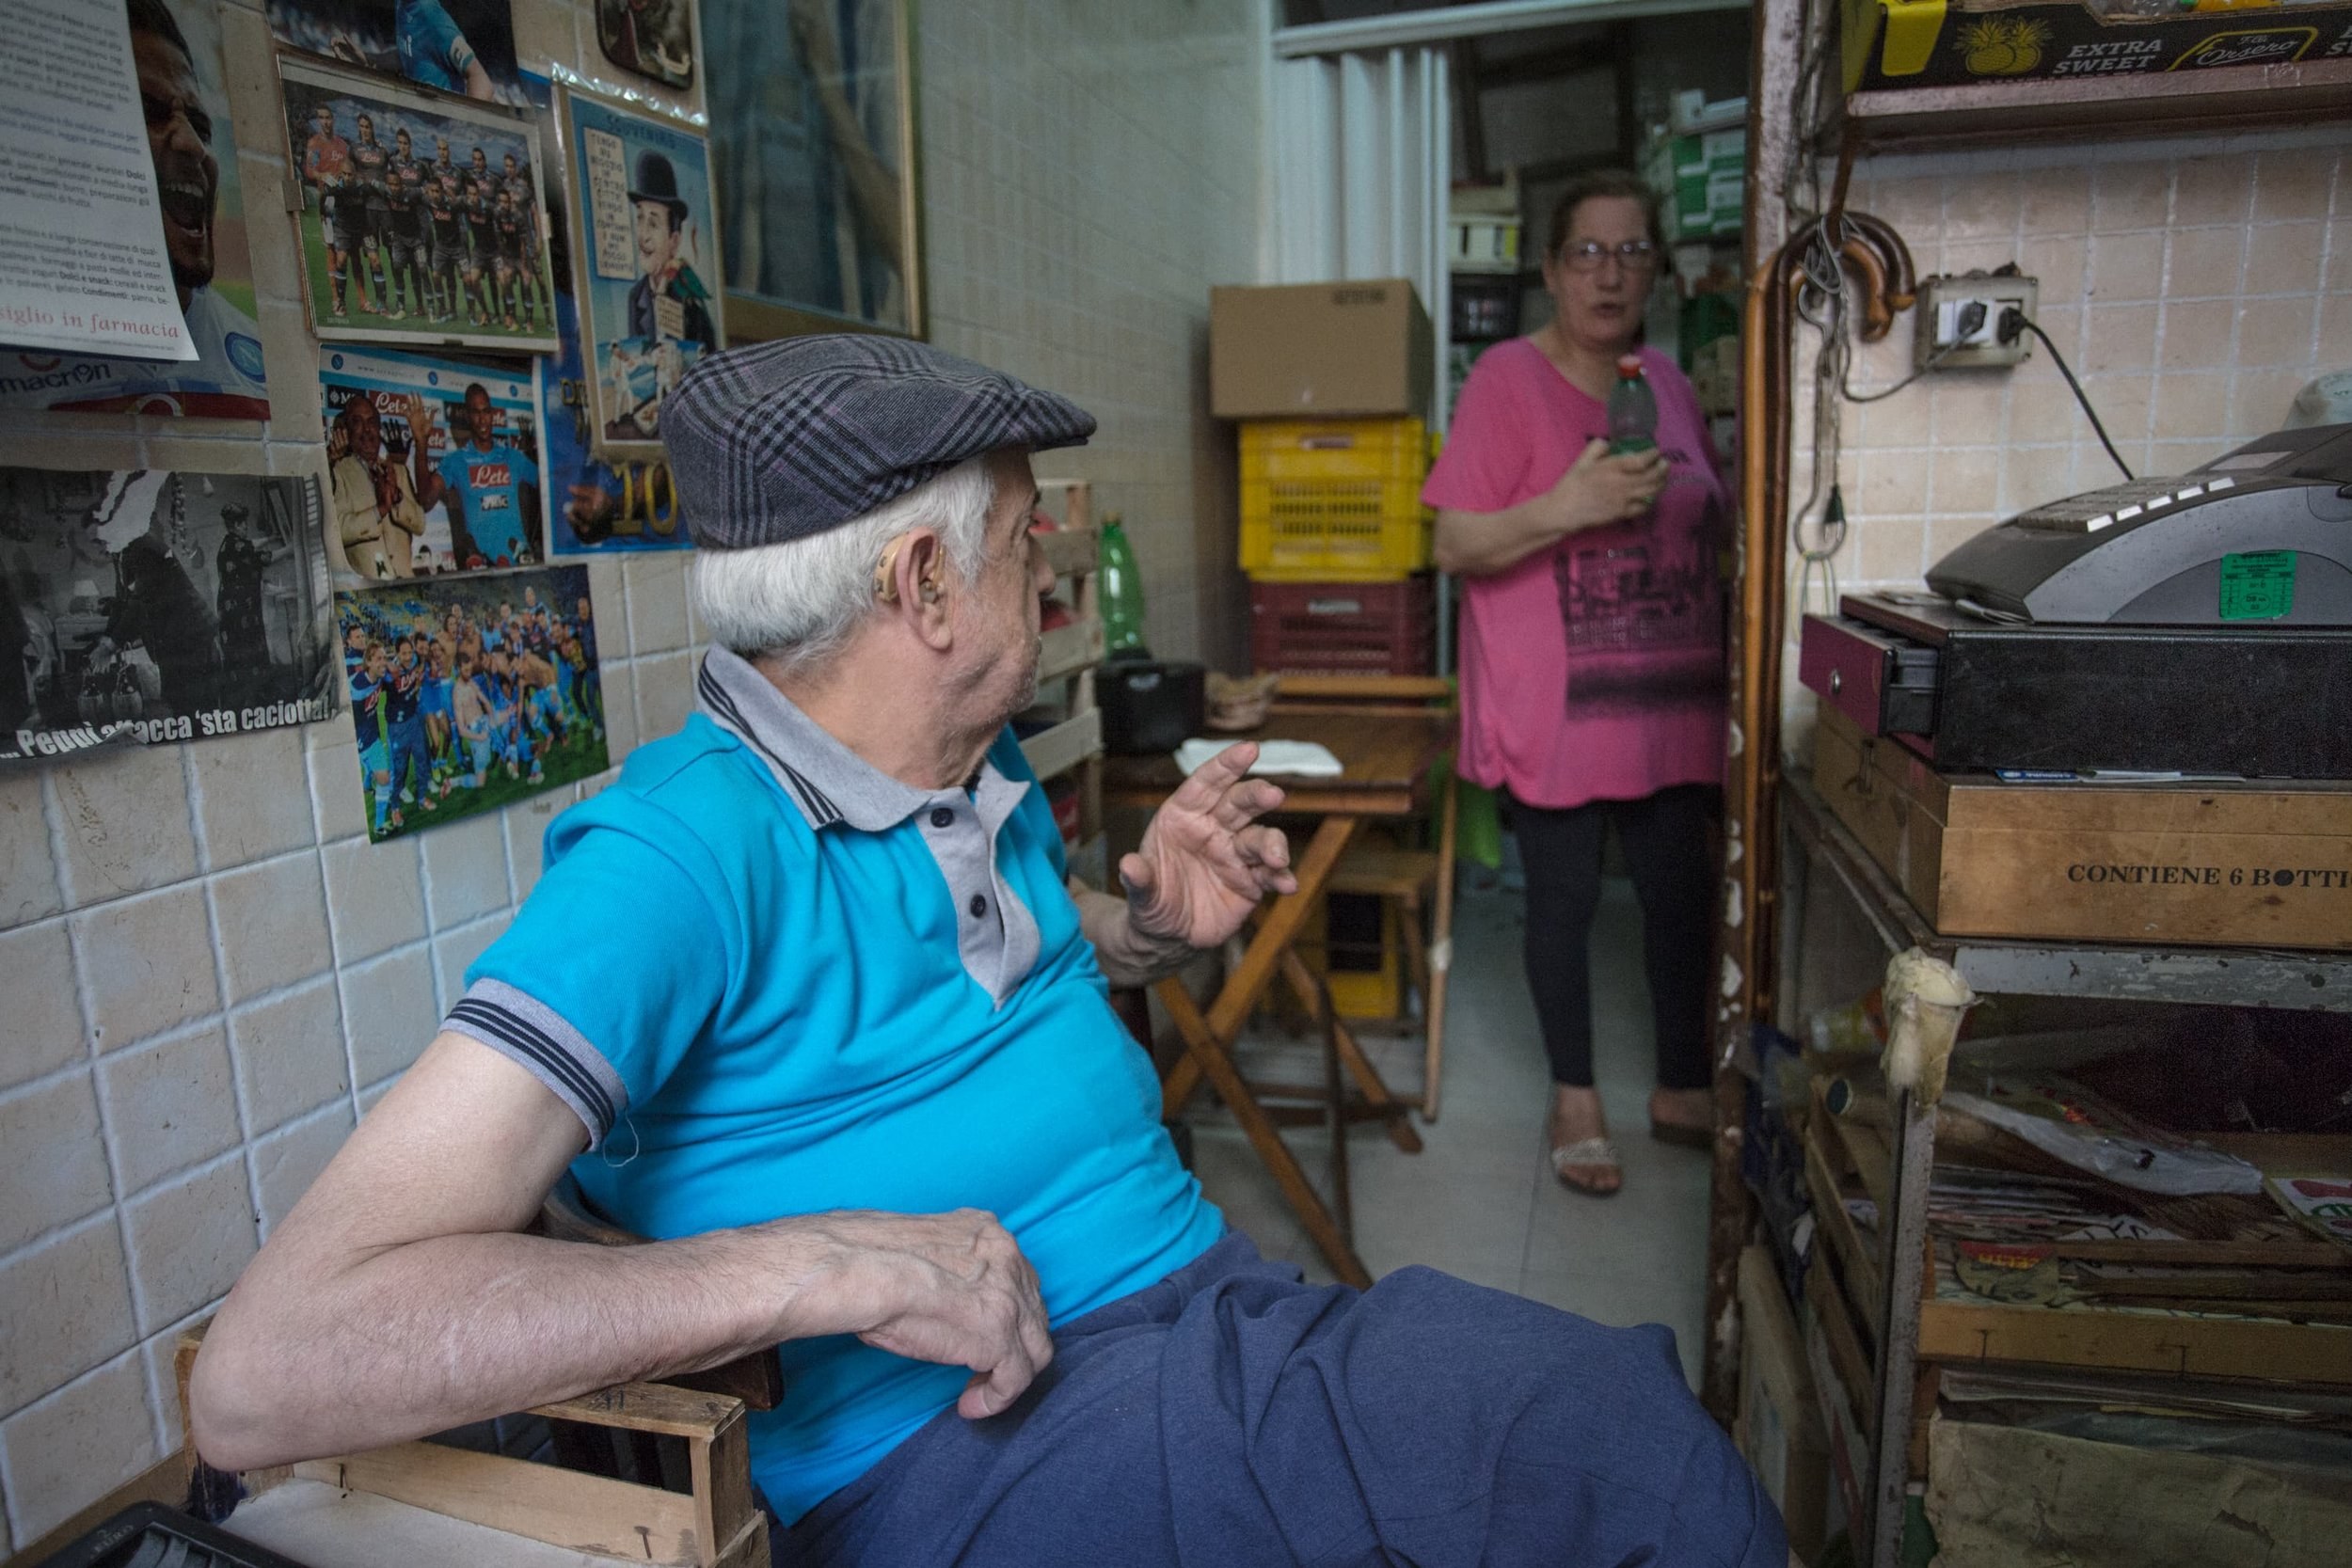 documentary_reportage_asl_fabio_burrelli_6.jpg